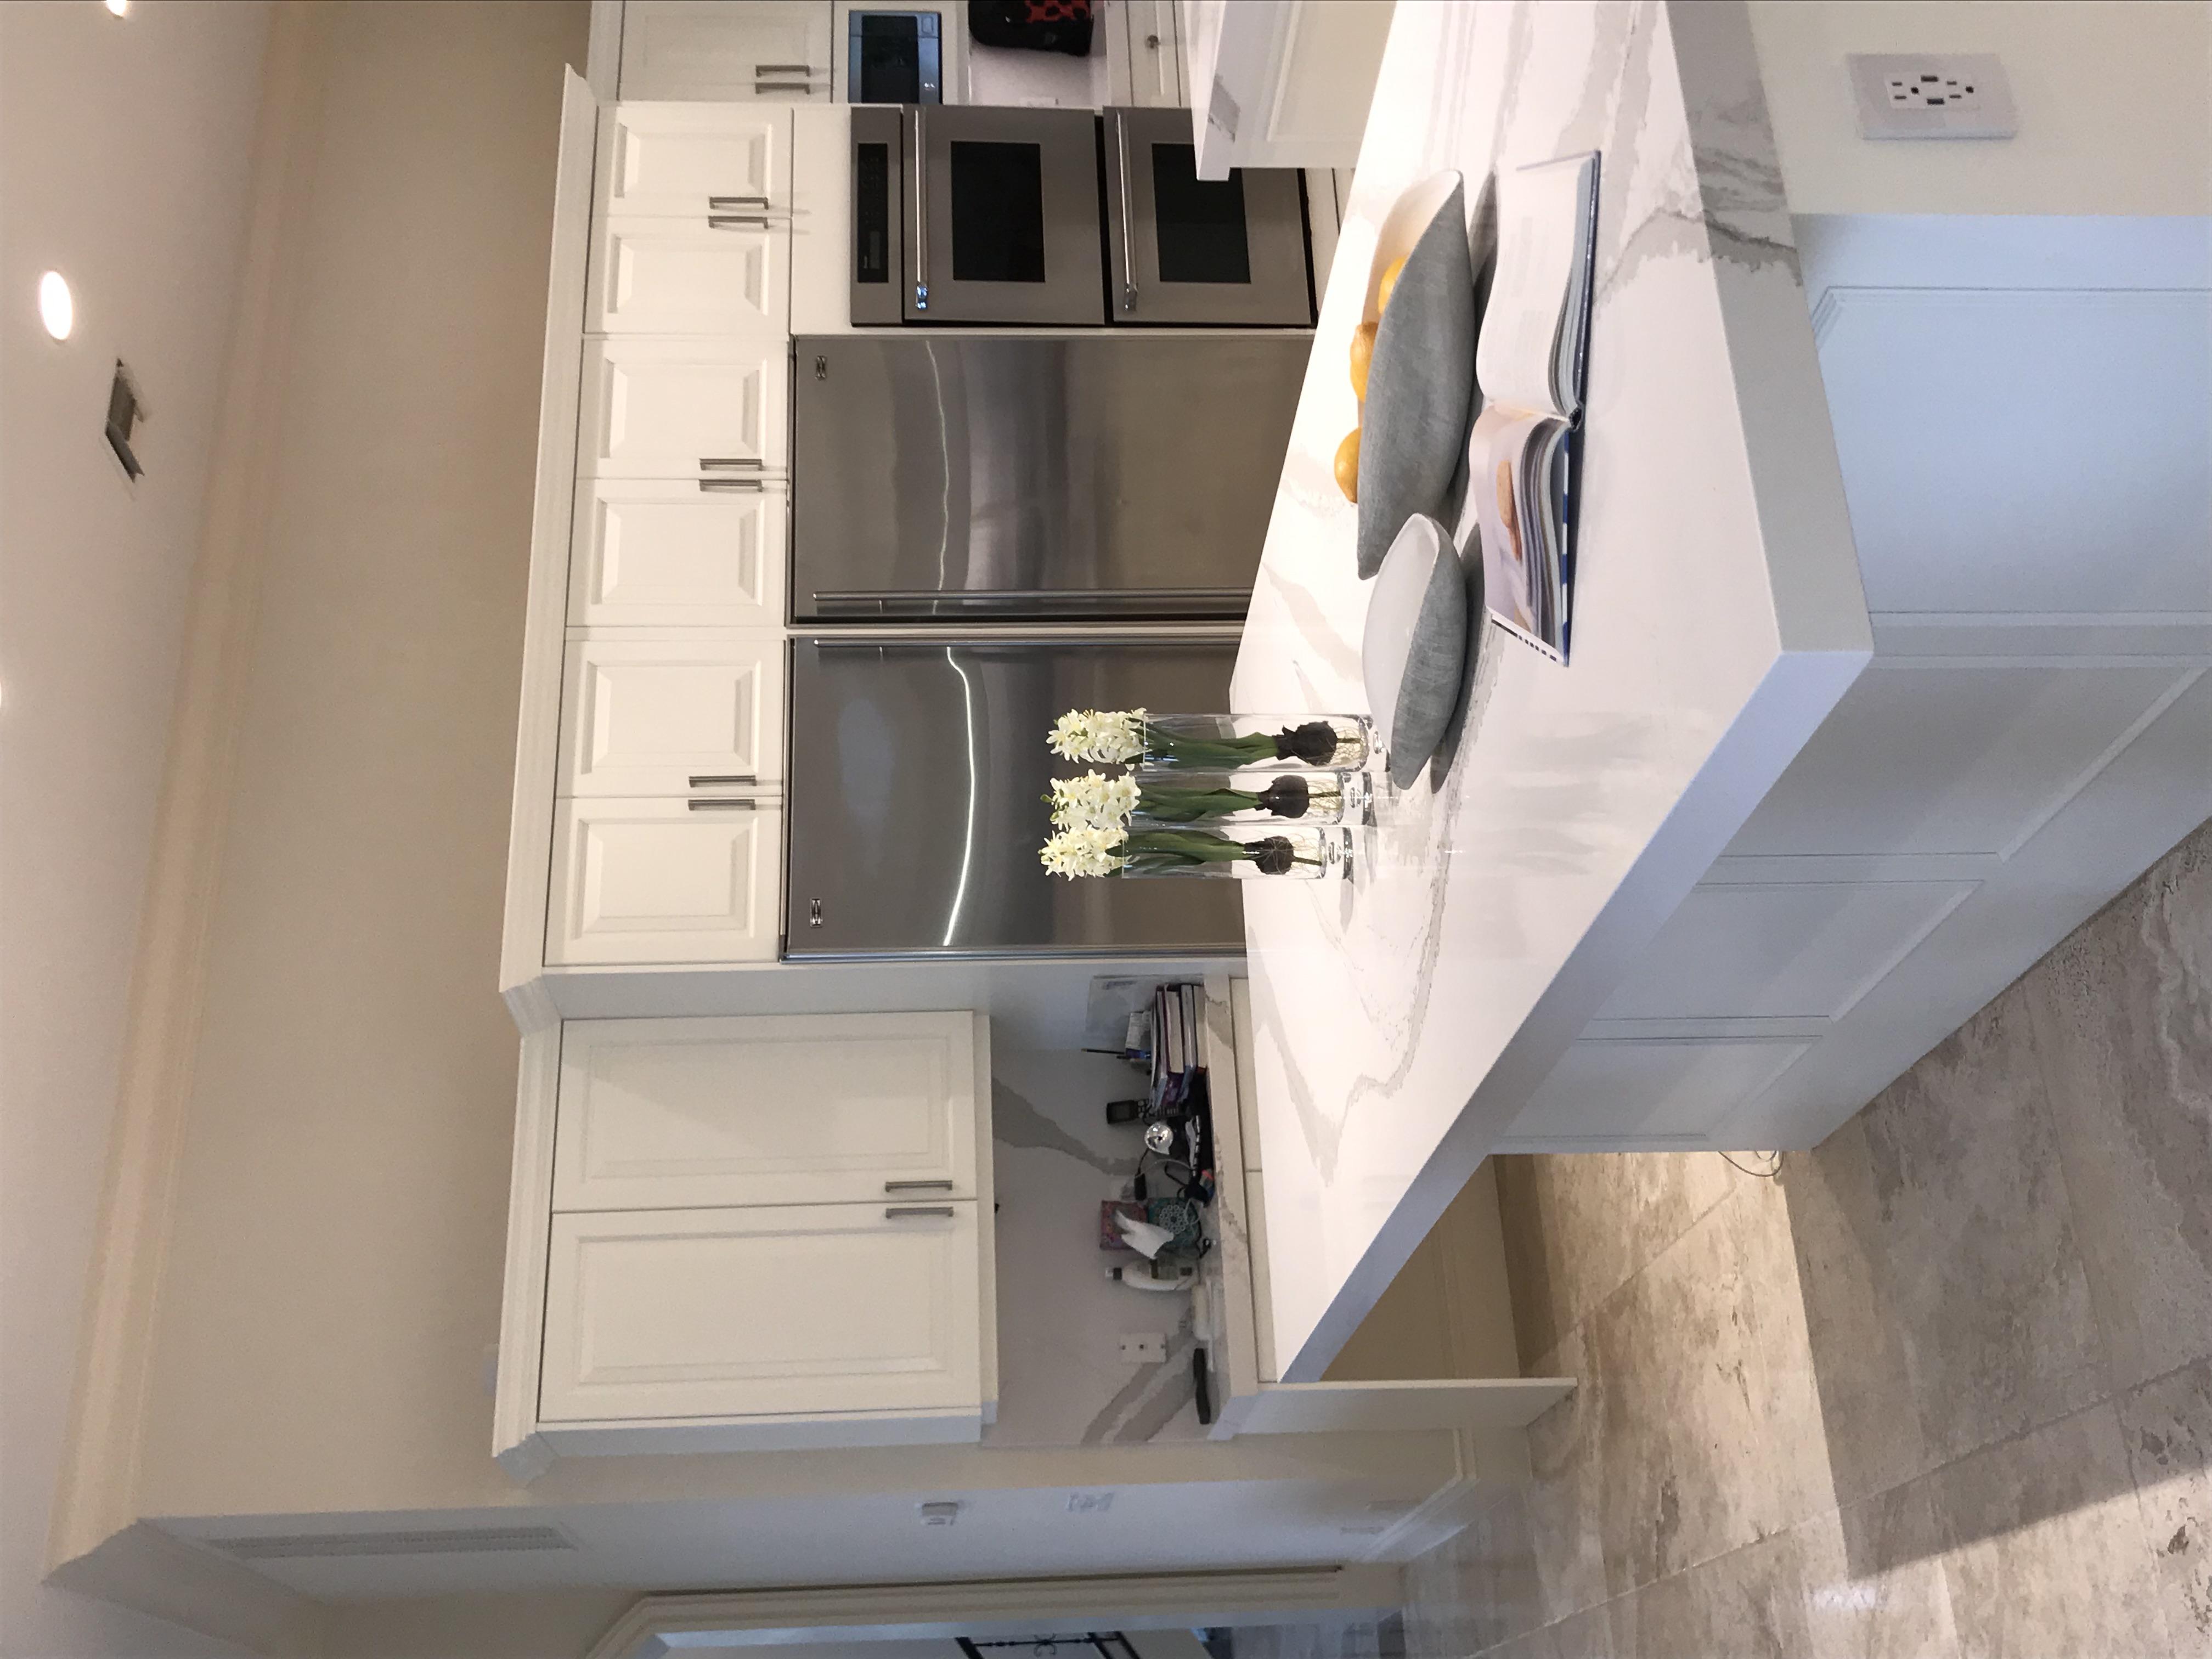 Kitchen Countertop Fabrication & Installation, Delray Beach, FL